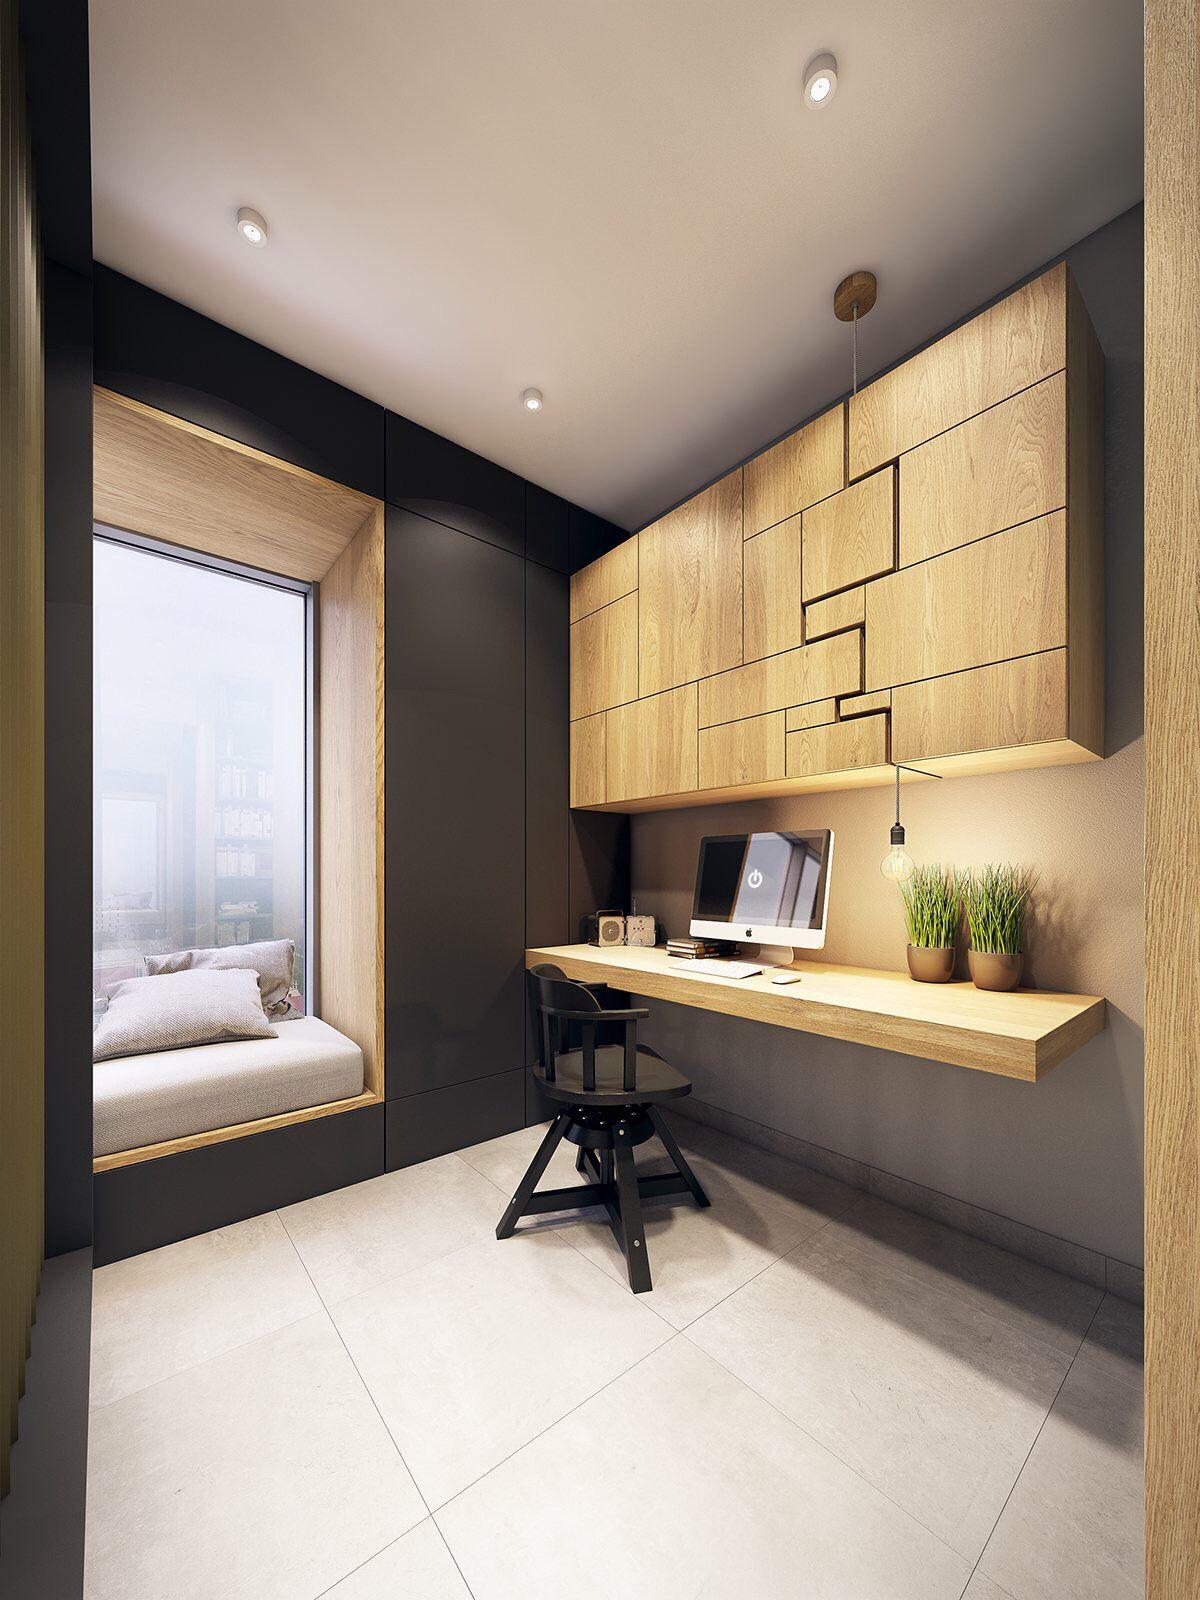 Interior Design에 있는 T.J. 핀 인테리어, 집 디자인, 집